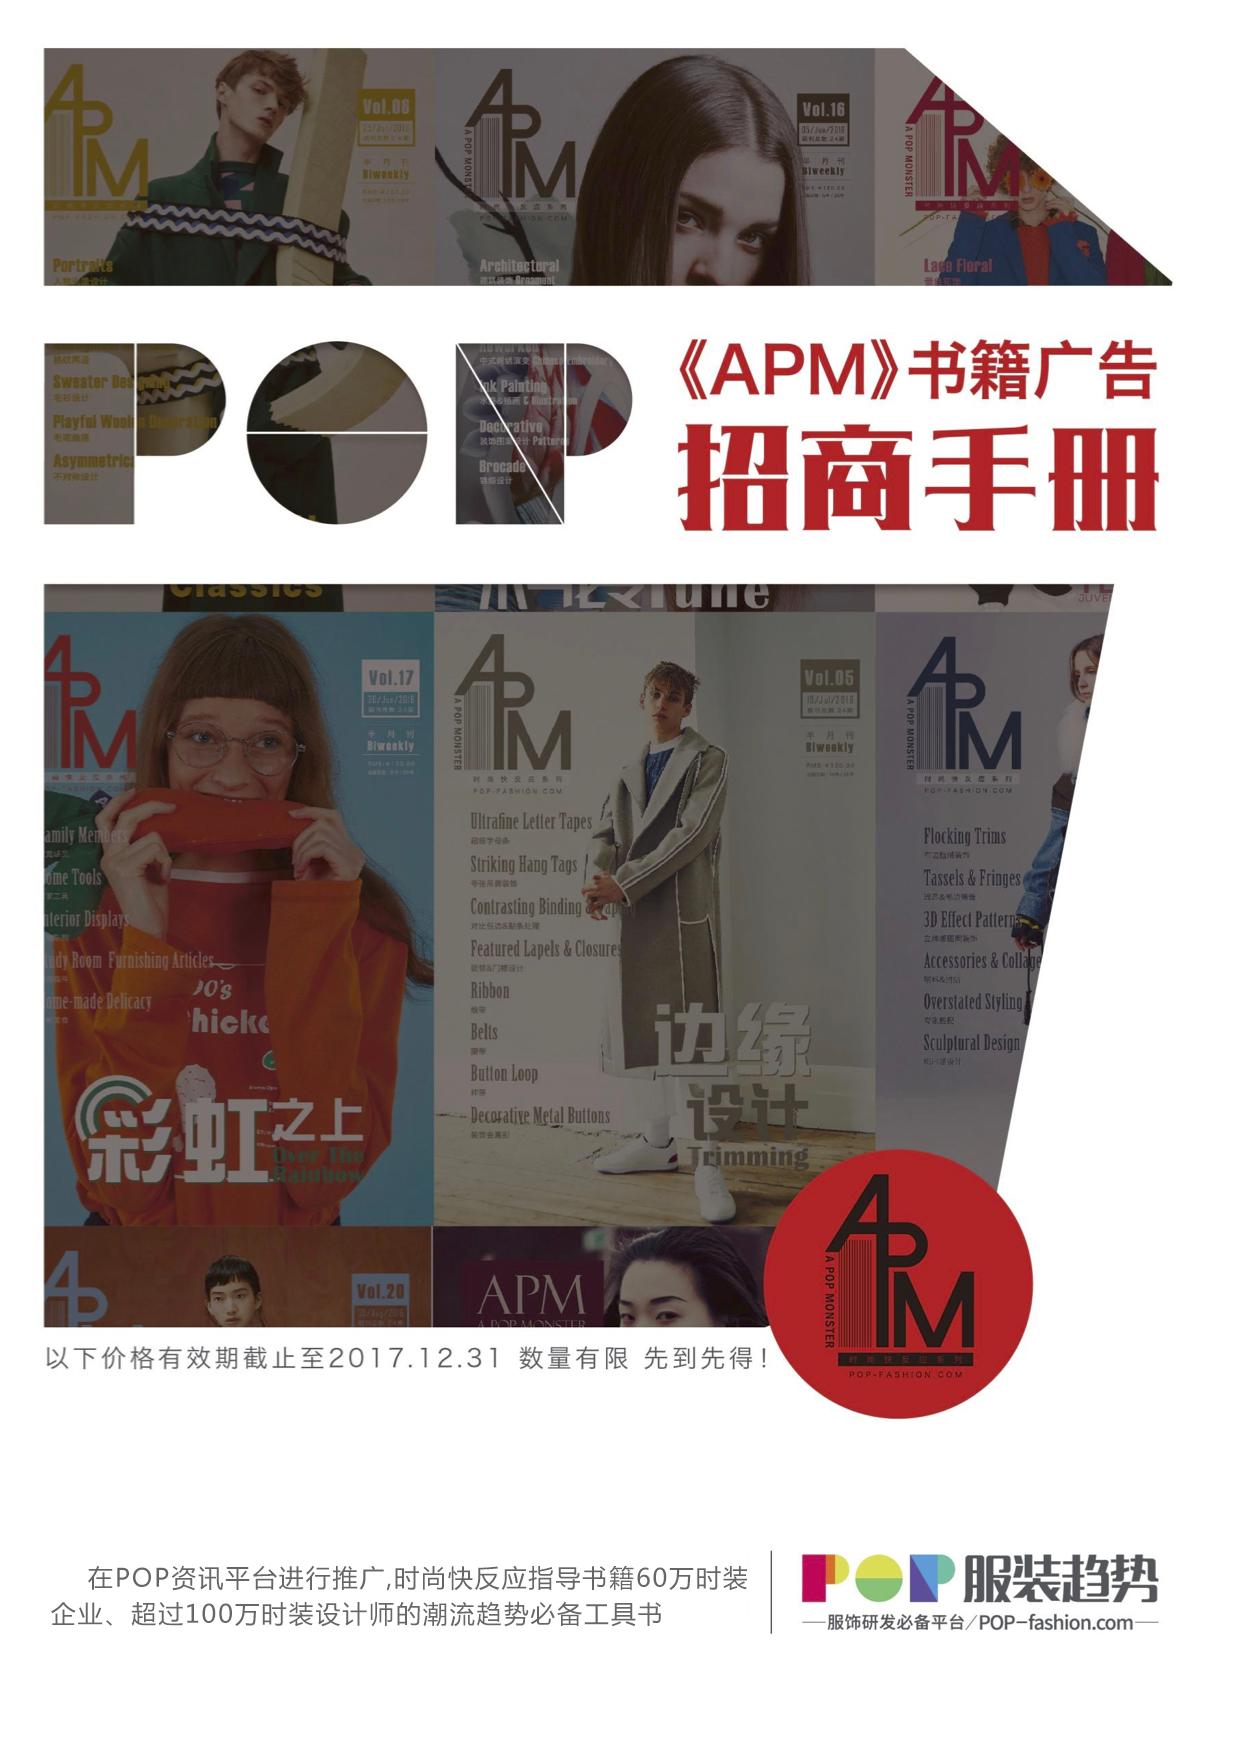 《APM》书籍广告